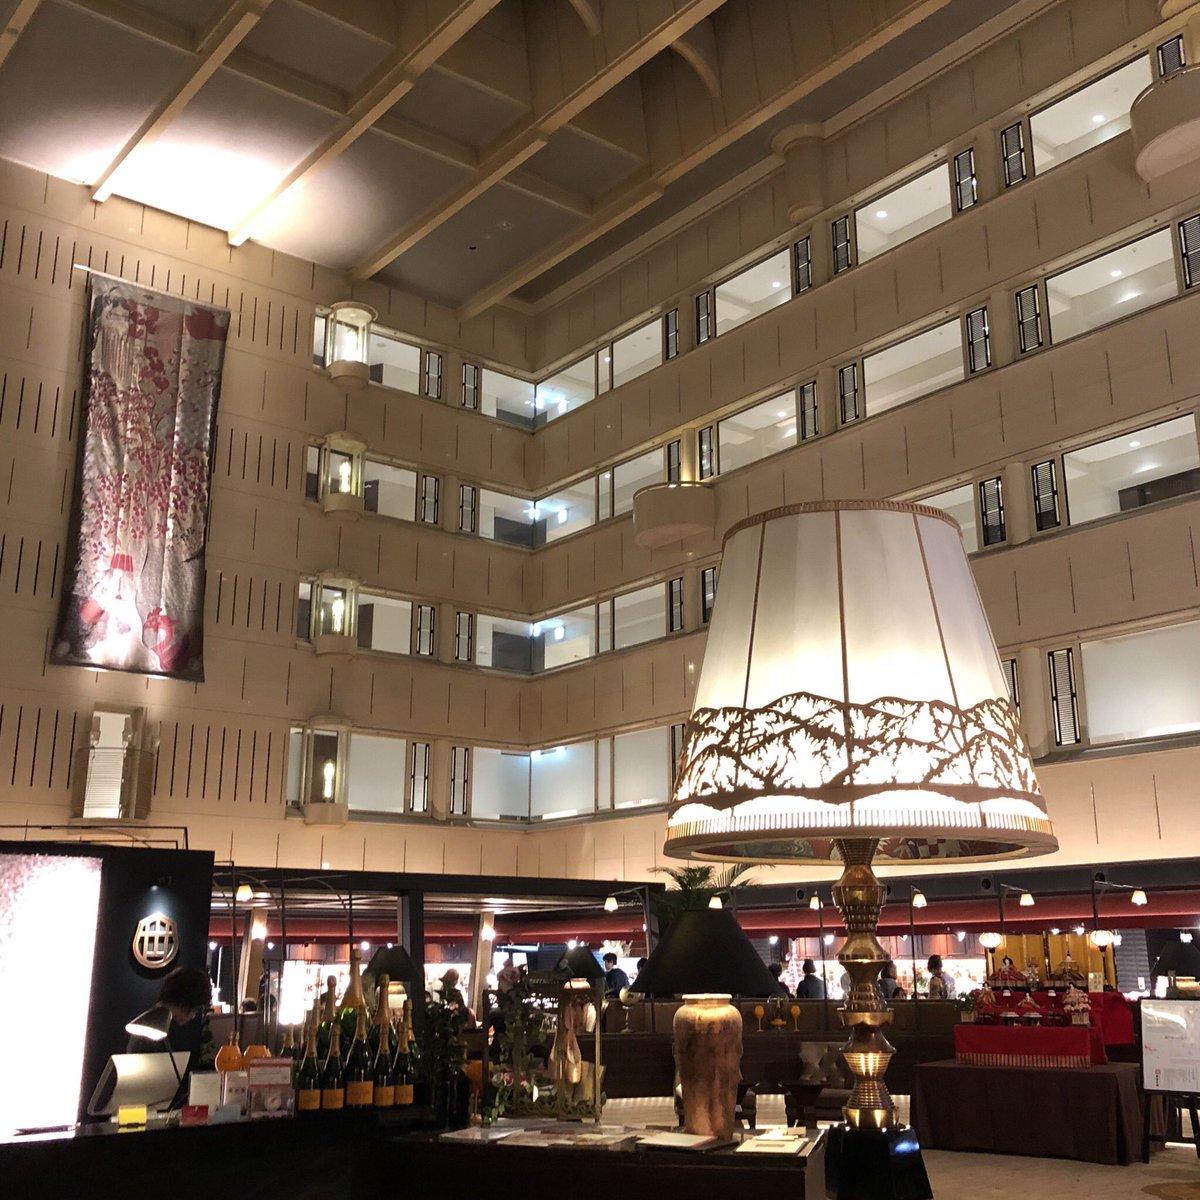 test ツイッターメディア - 昨日は立命館大学OICで科研費研究等の総括ワークショップ、その後は京都センチュリーホテルで懇親会。今月一杯で改装閉館とのこと。パークホテル(現ハイアット)・ホテルフジタ(現リッツカールトン)・ロイヤルホテルに続きこちらも歴史になりますね。 https://t.co/hzdVO2n5Cw